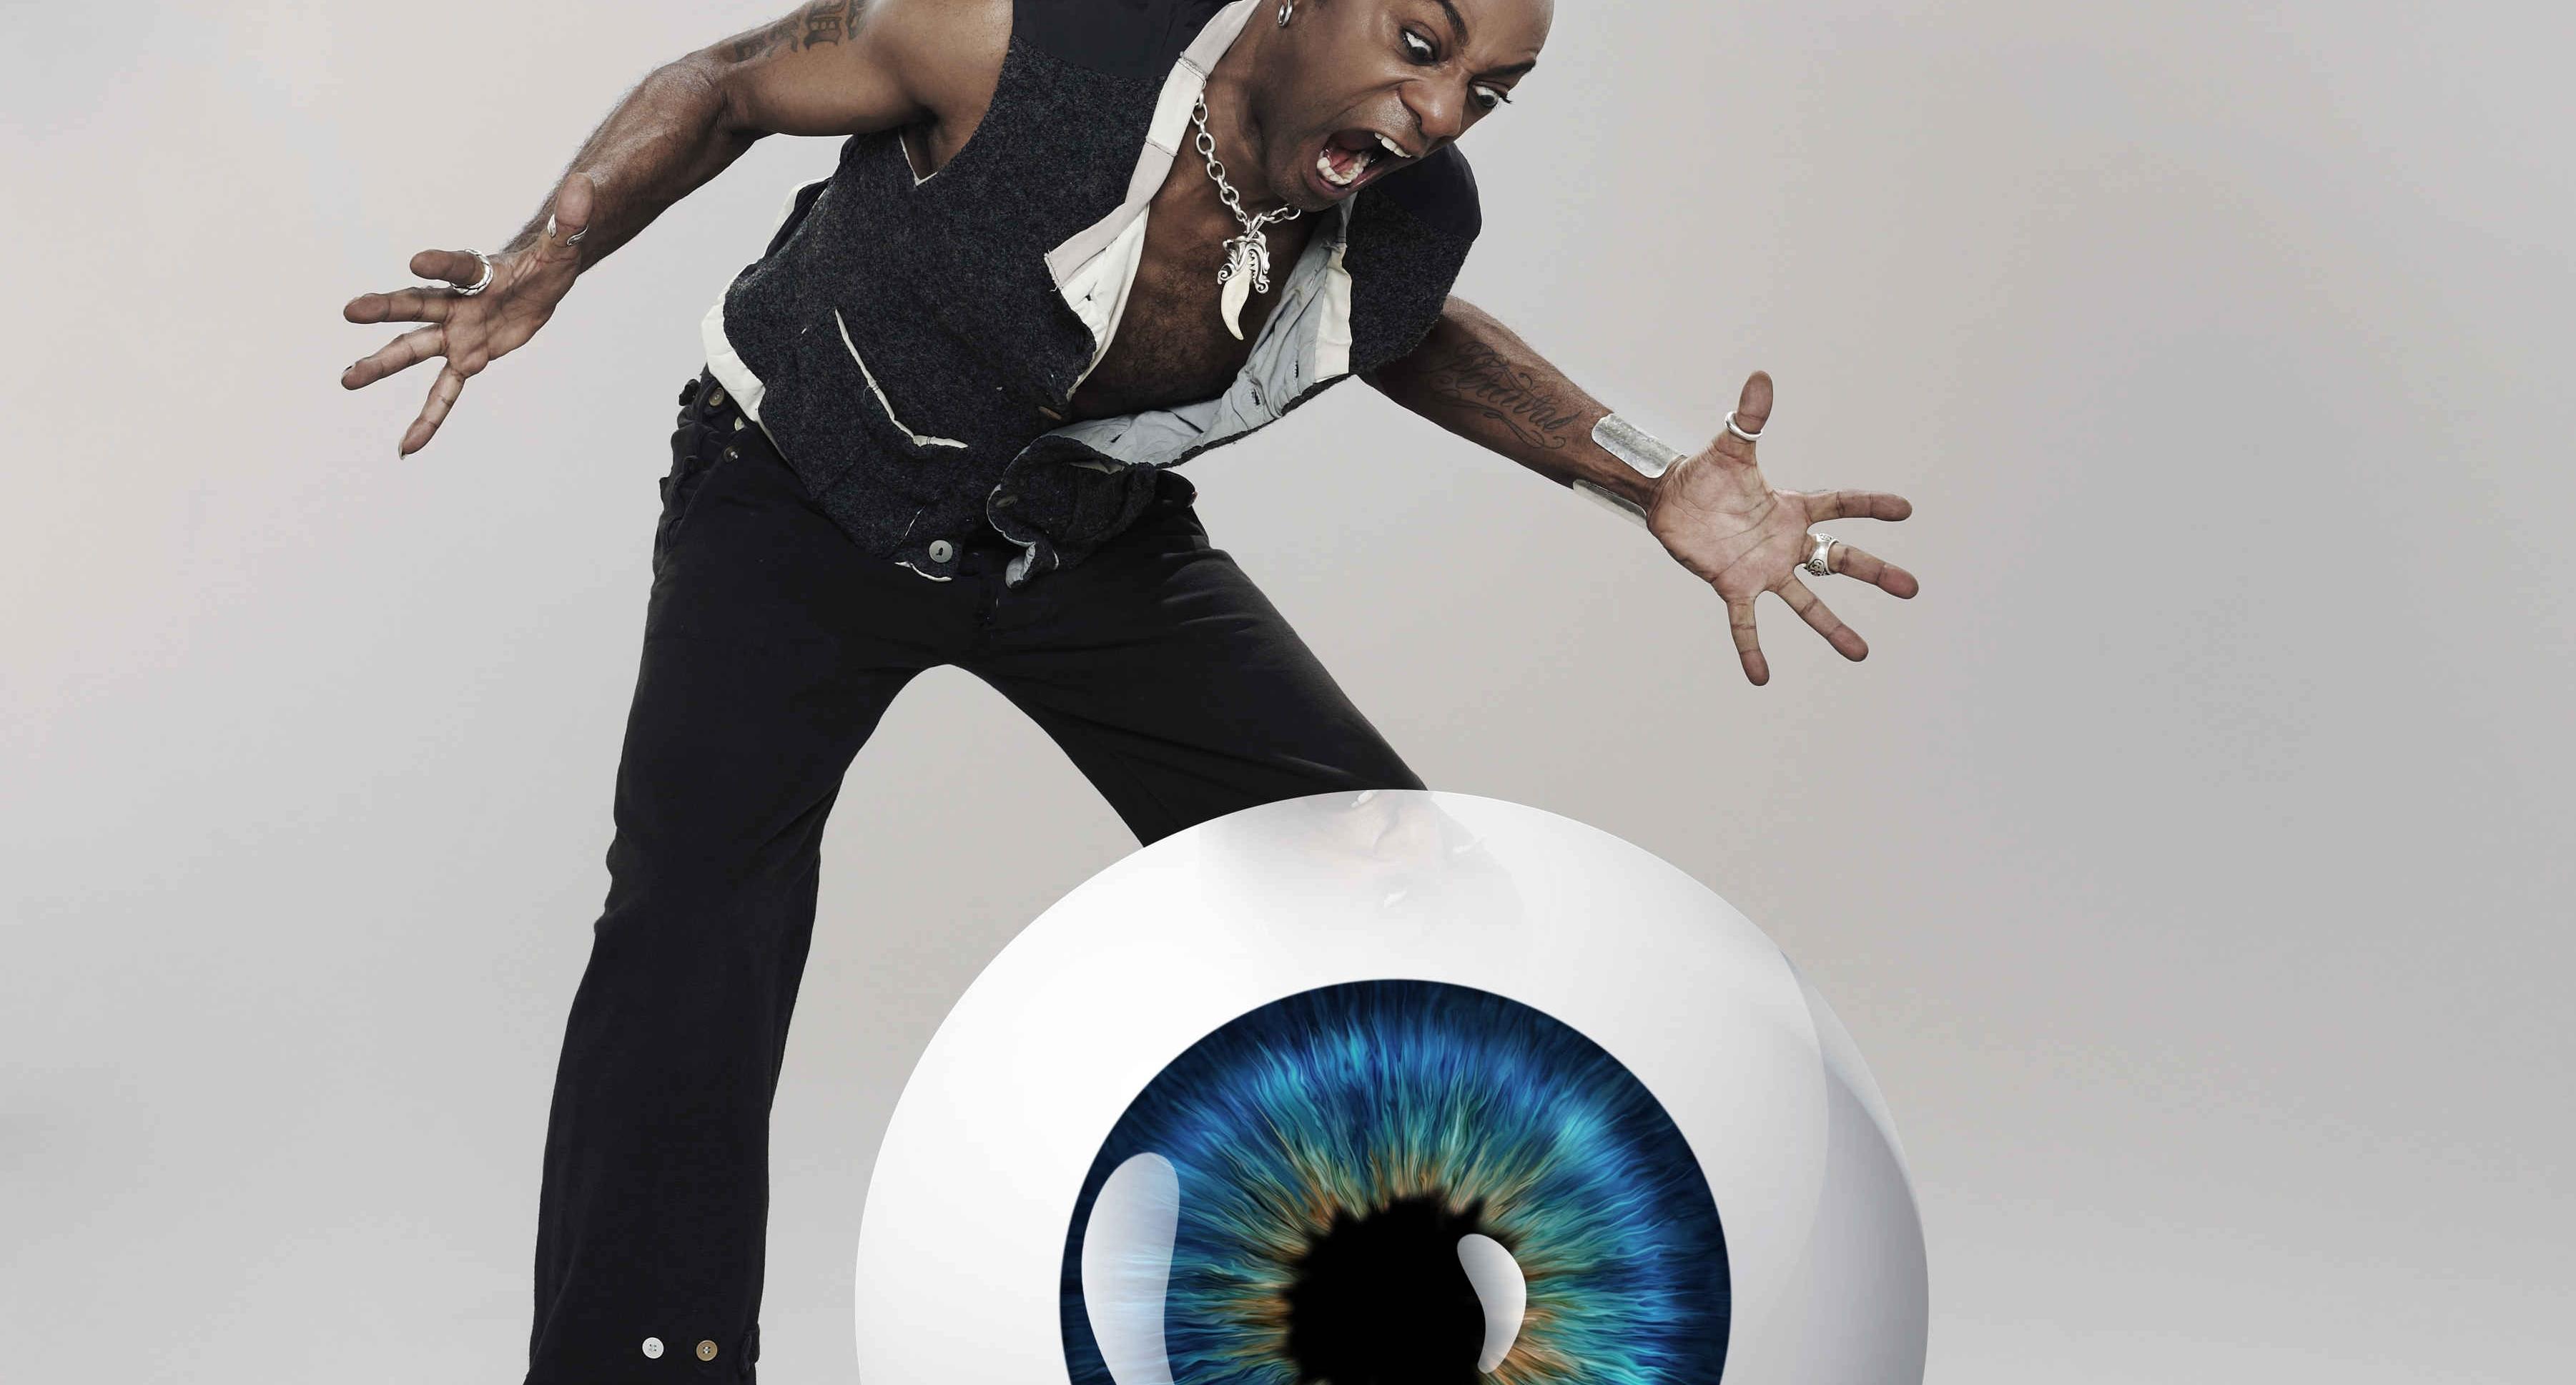 Percival Duke Promi Big Brother 2013 Auge